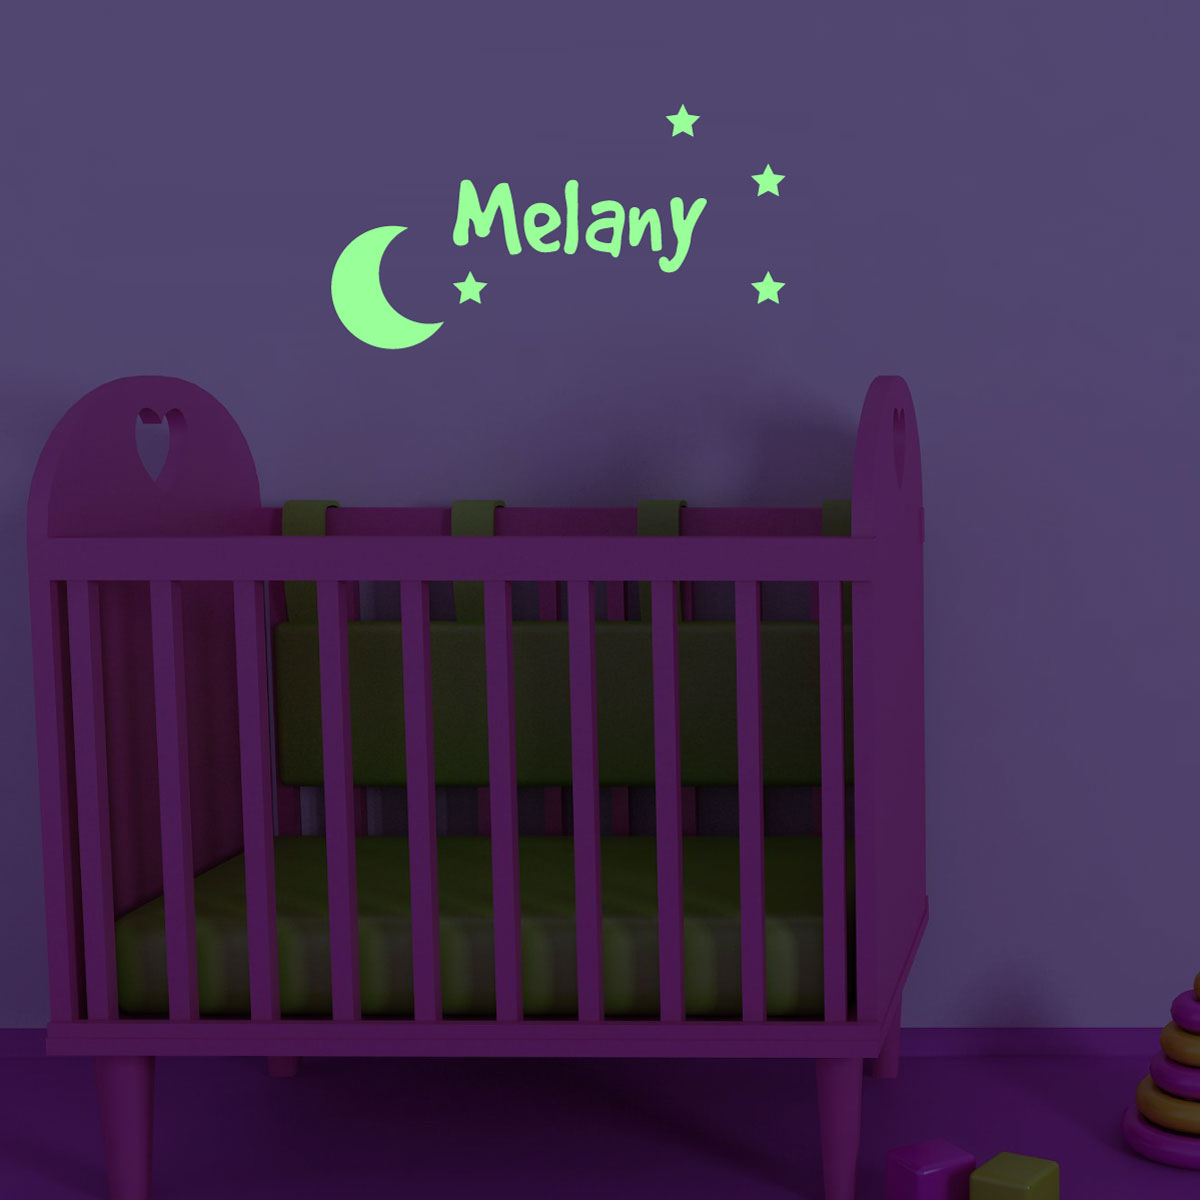 stickers muraux pr nom phosforescente sticker mural la lune et les toiles ambiance. Black Bedroom Furniture Sets. Home Design Ideas